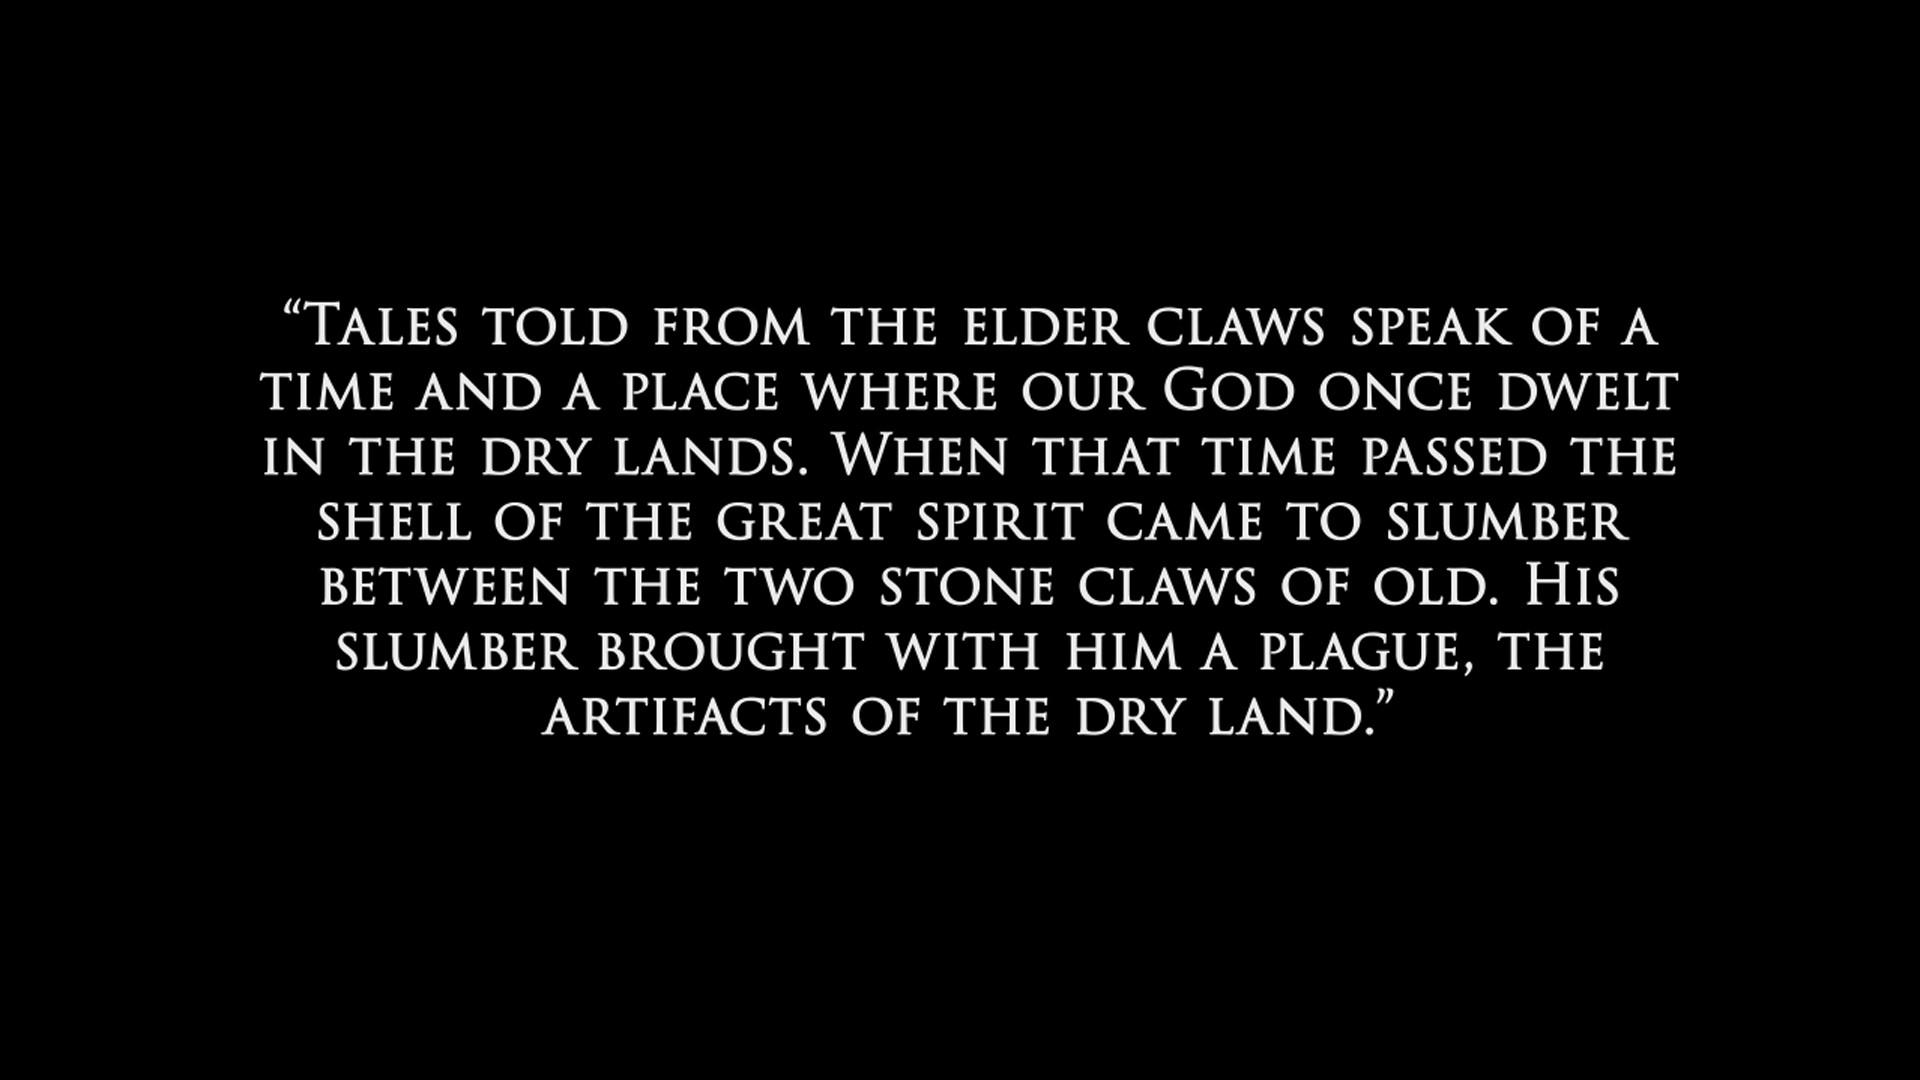 Martin pietras text 2